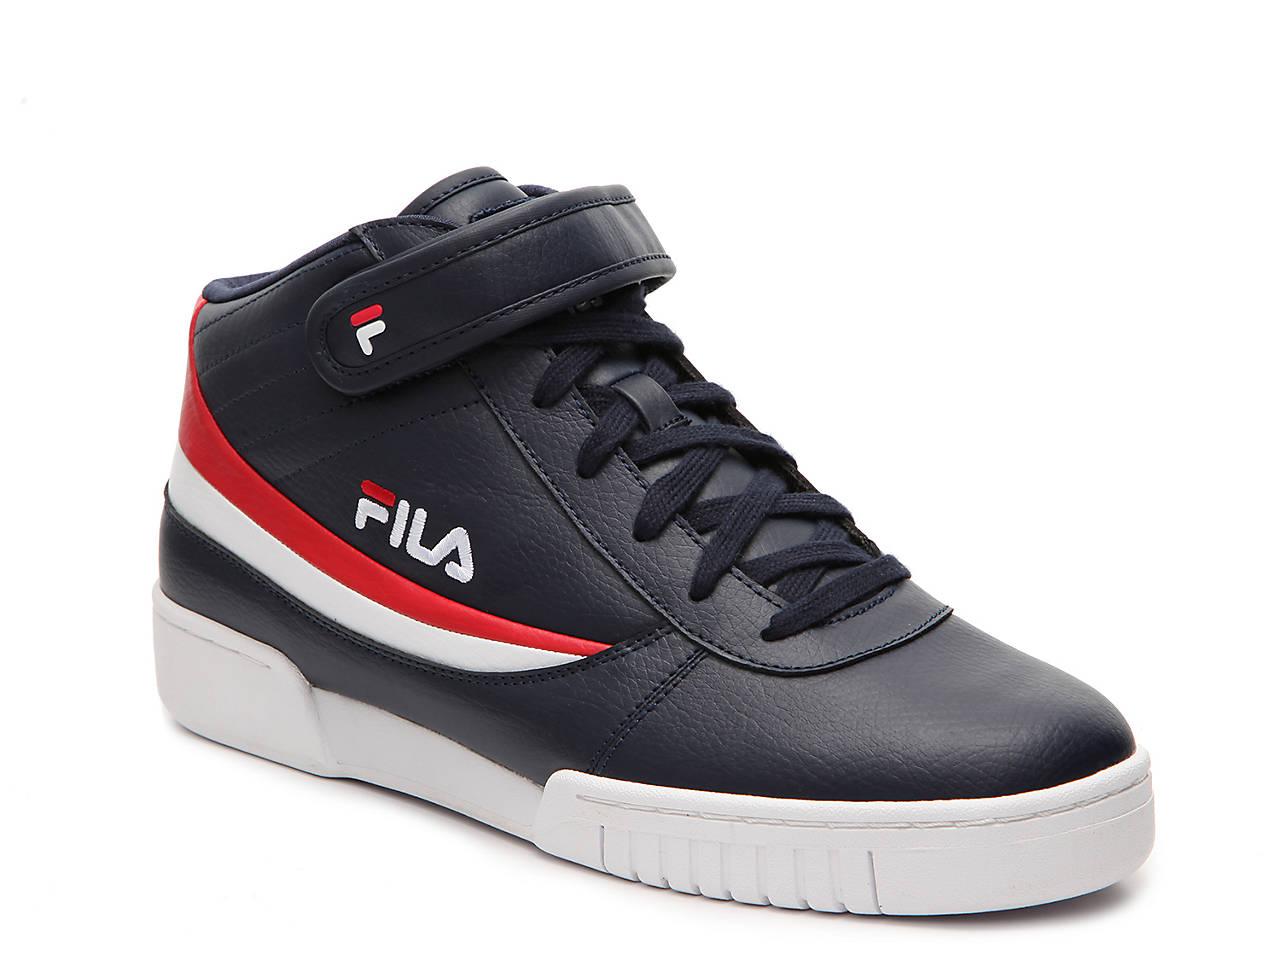 bb7a7e623465 Fila Fitness 89 Basketball Shoes - Men s Men s Shoes